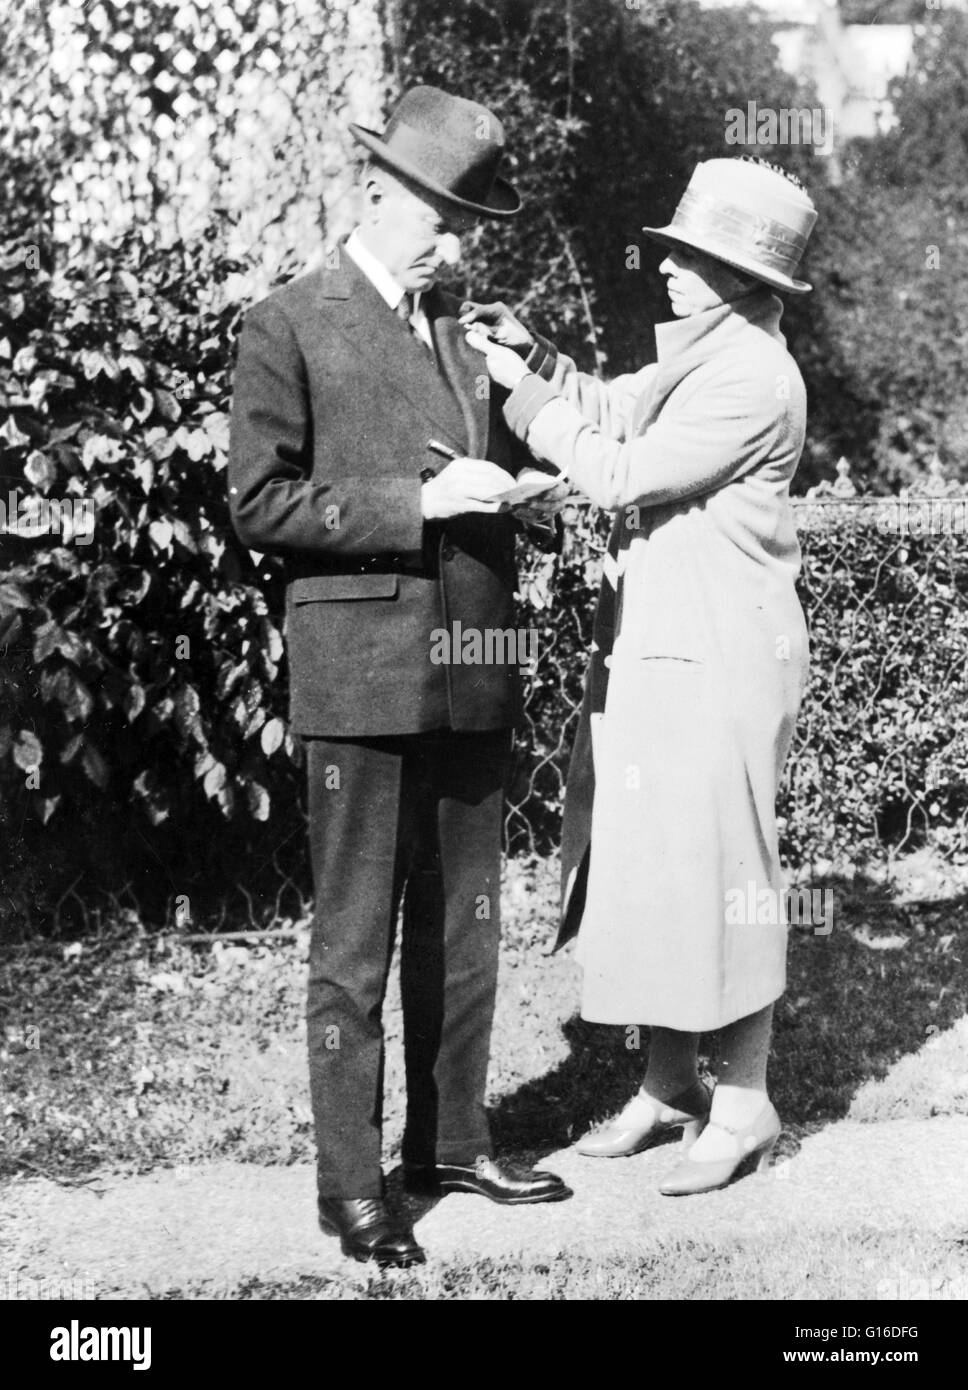 Mrs. Calvin Coolidge enrolls the President in the American Red Cross, October 29, 1924. John Calvin Coolidge, Jr. Stock Photo